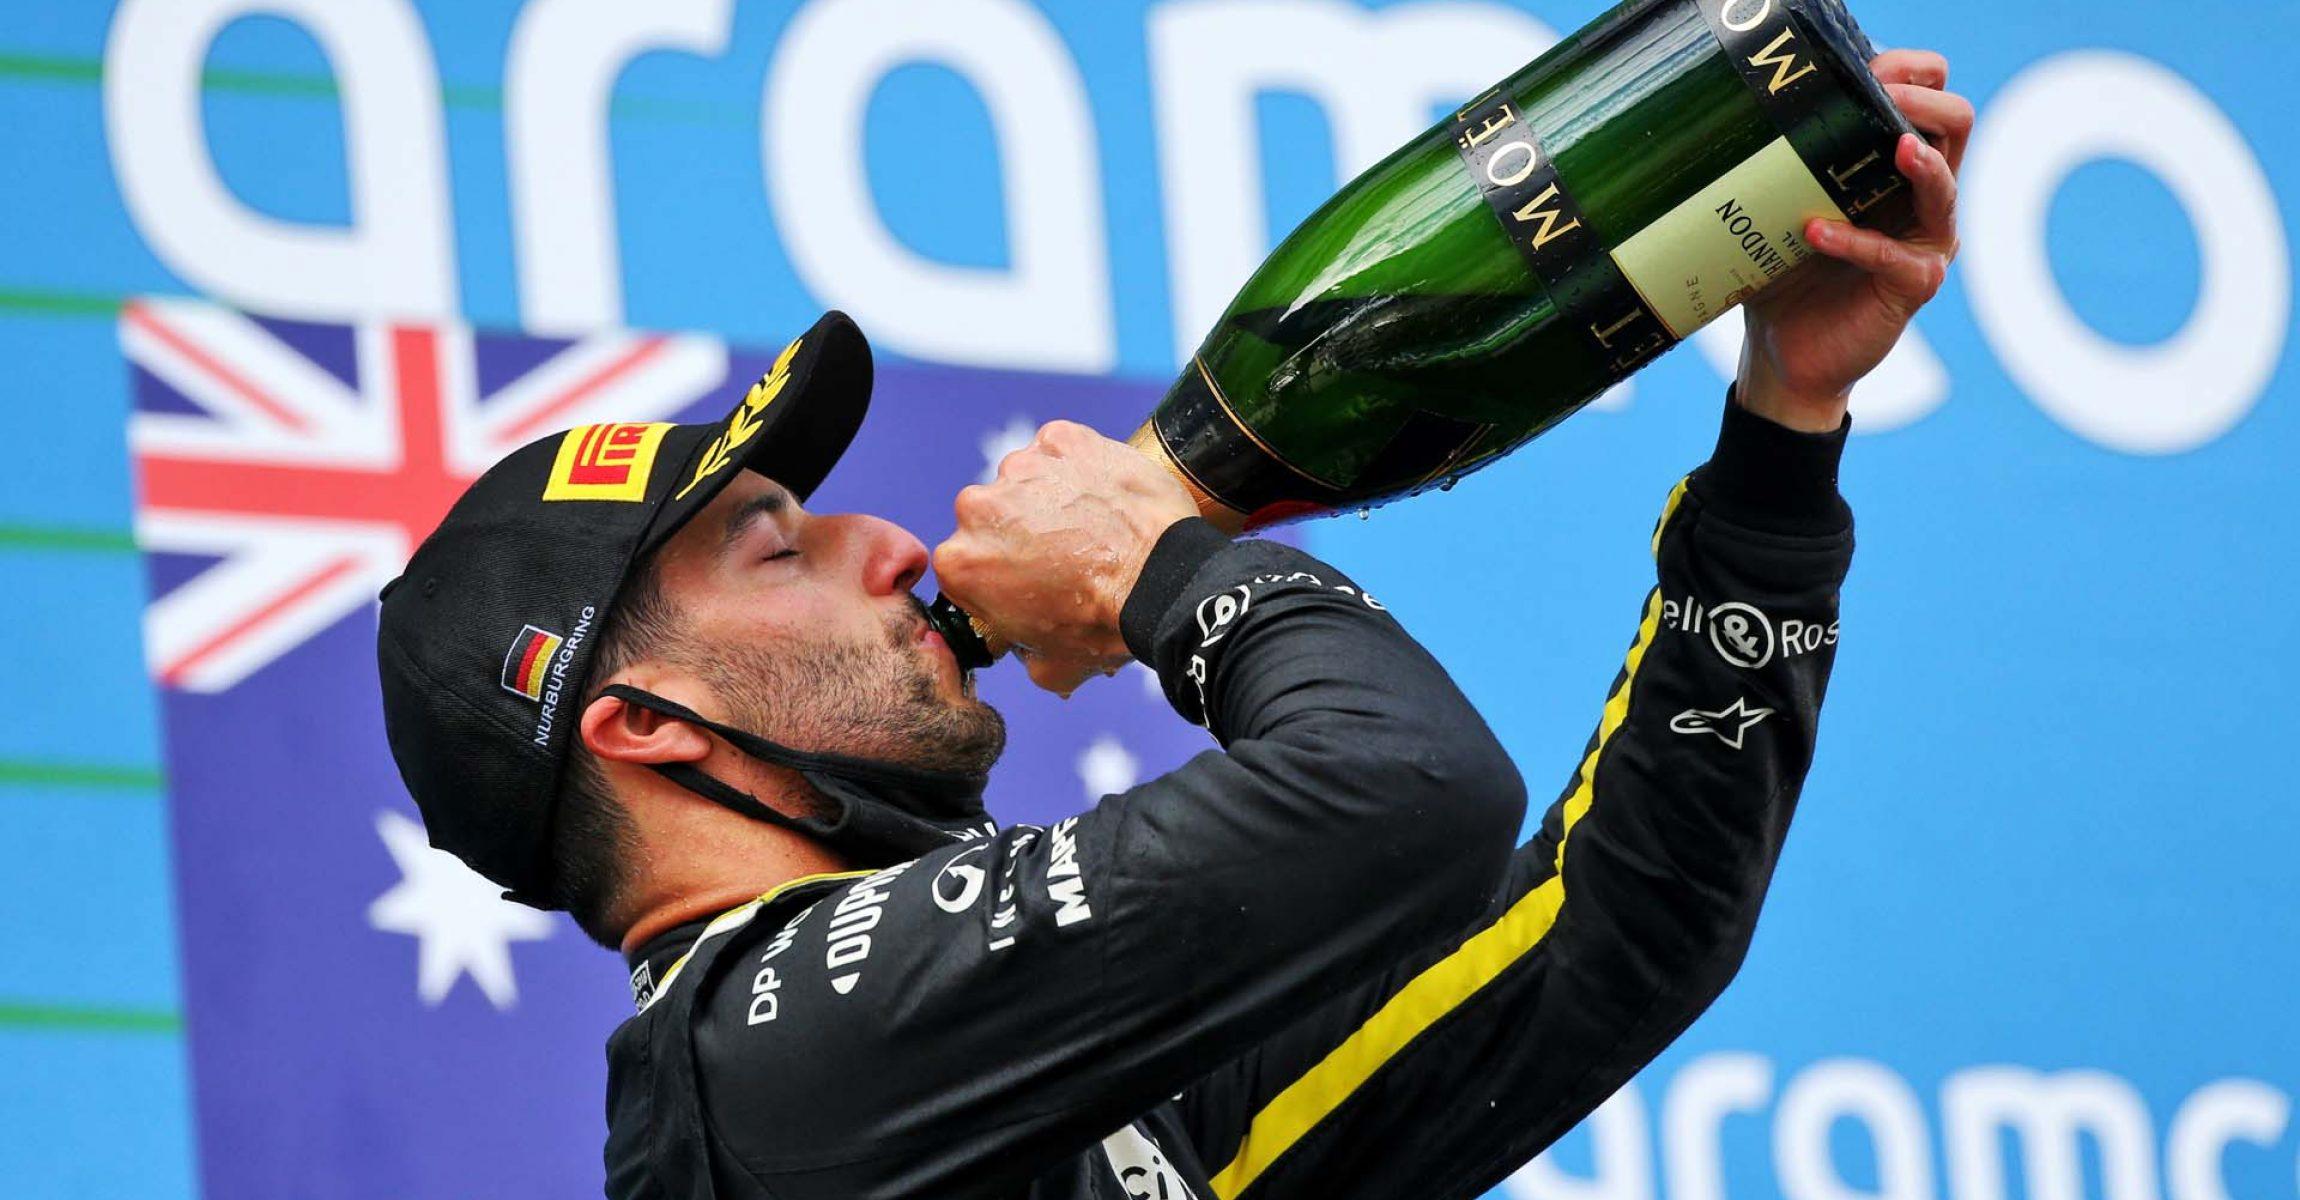 Daniel Ricciardo (AUS) Renault F1 Team celebrates his third position on the podium. Eifel Grand Prix, Sunday 11th October 2020. Nurbugring, Germany.